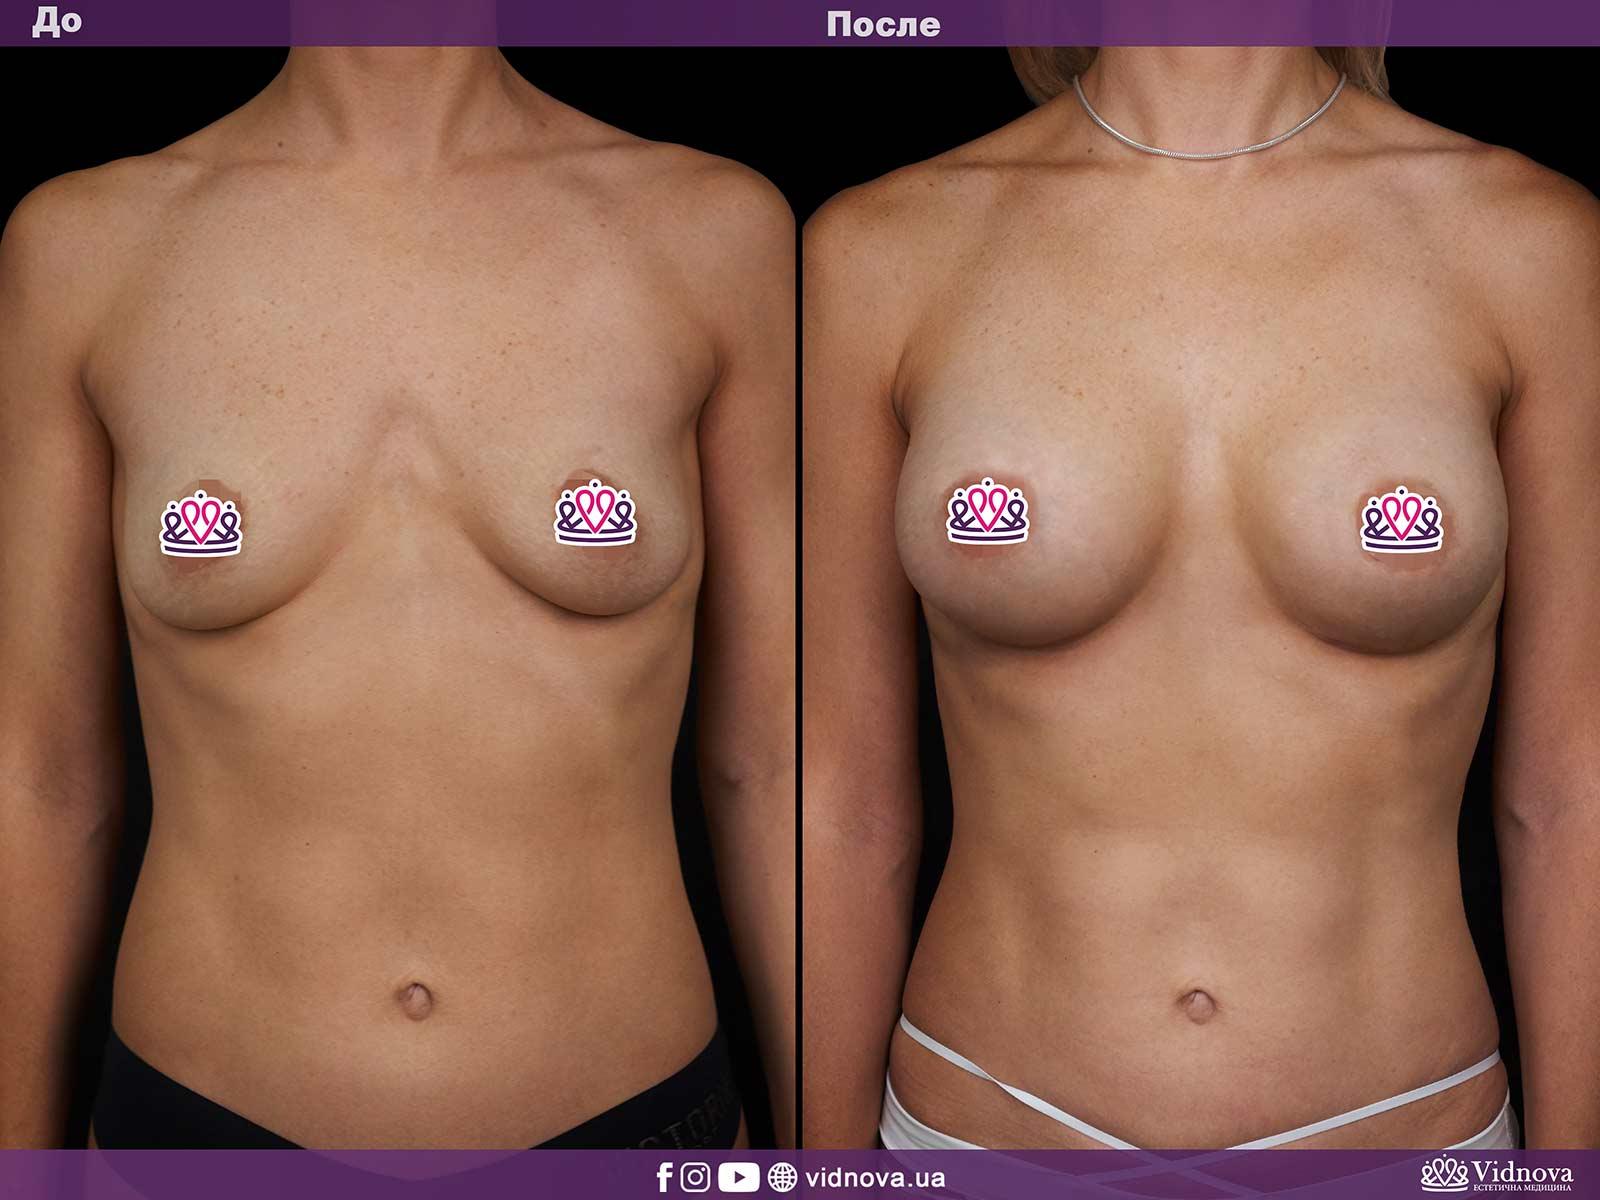 Увеличение груди: Фото ДО и ПОСЛЕ - Пример №4-1 - Клиника Vidnova